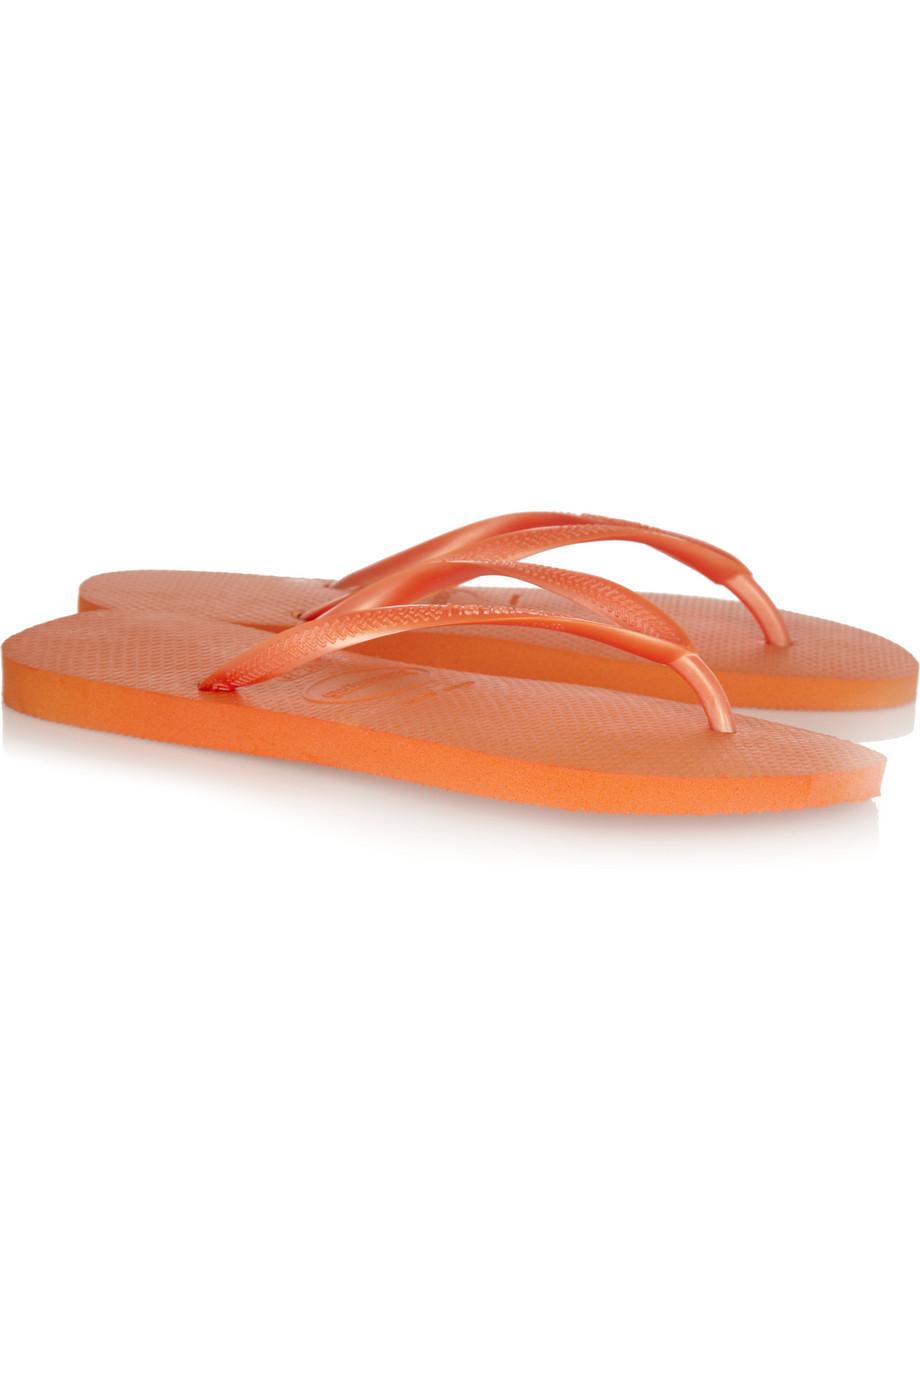 6067bd95585d Havaianas Slim Neon Rubber Flip Flops in Orange - Lyst